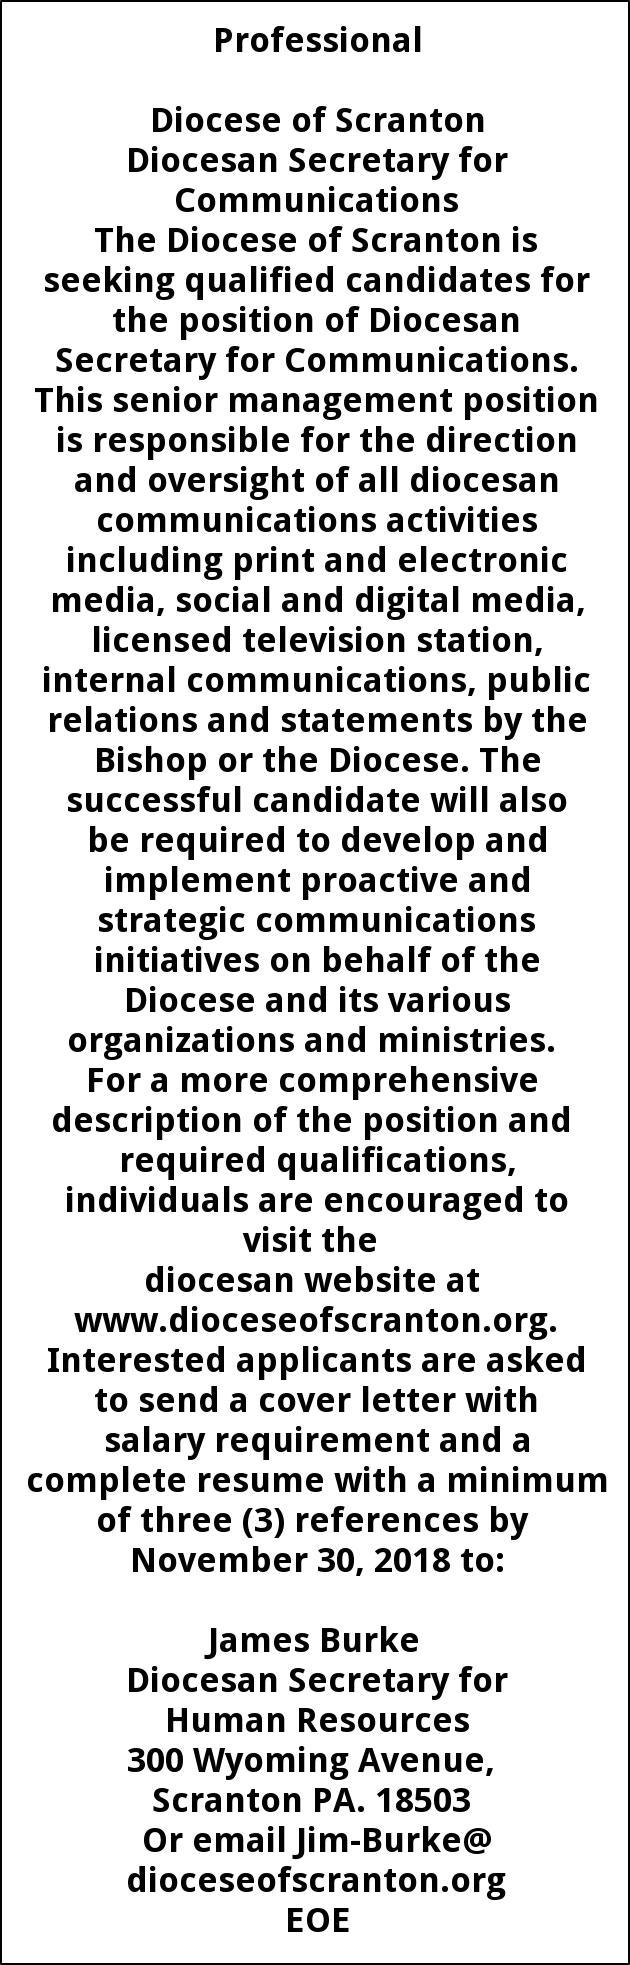 Diocesan Secretary for Communications